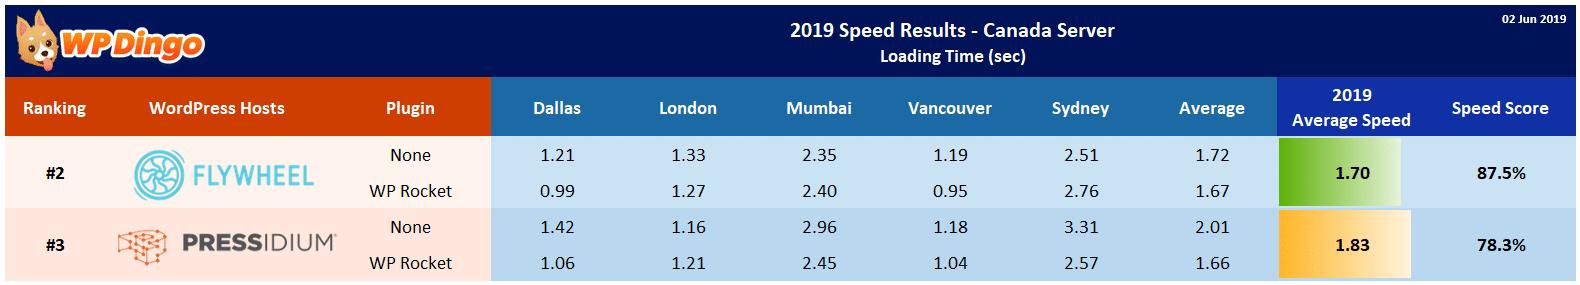 2019 Flywheel vs Pressidium Speed Table - Canada Server